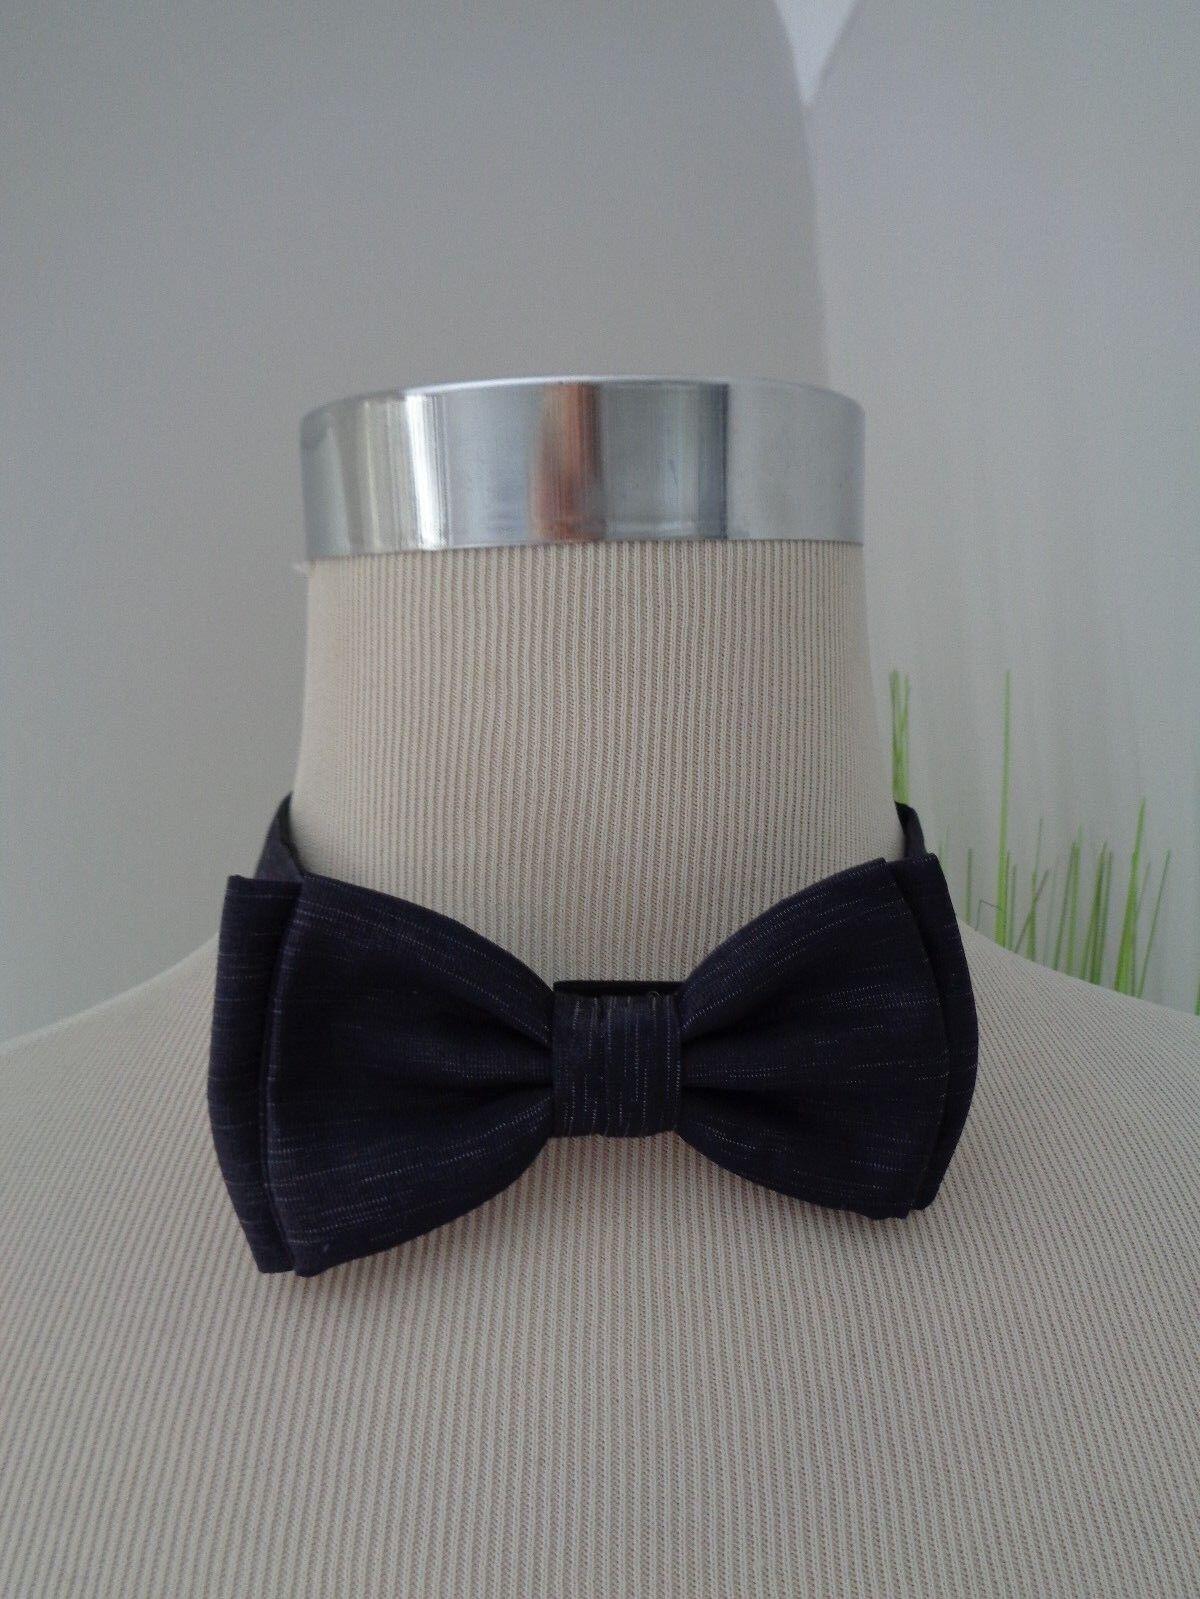 941f4734c679 Hugo Boss Italian Silk & Wool Dark Blue Bow Tie. Gift Idea Prom Save for  sale online | eBay